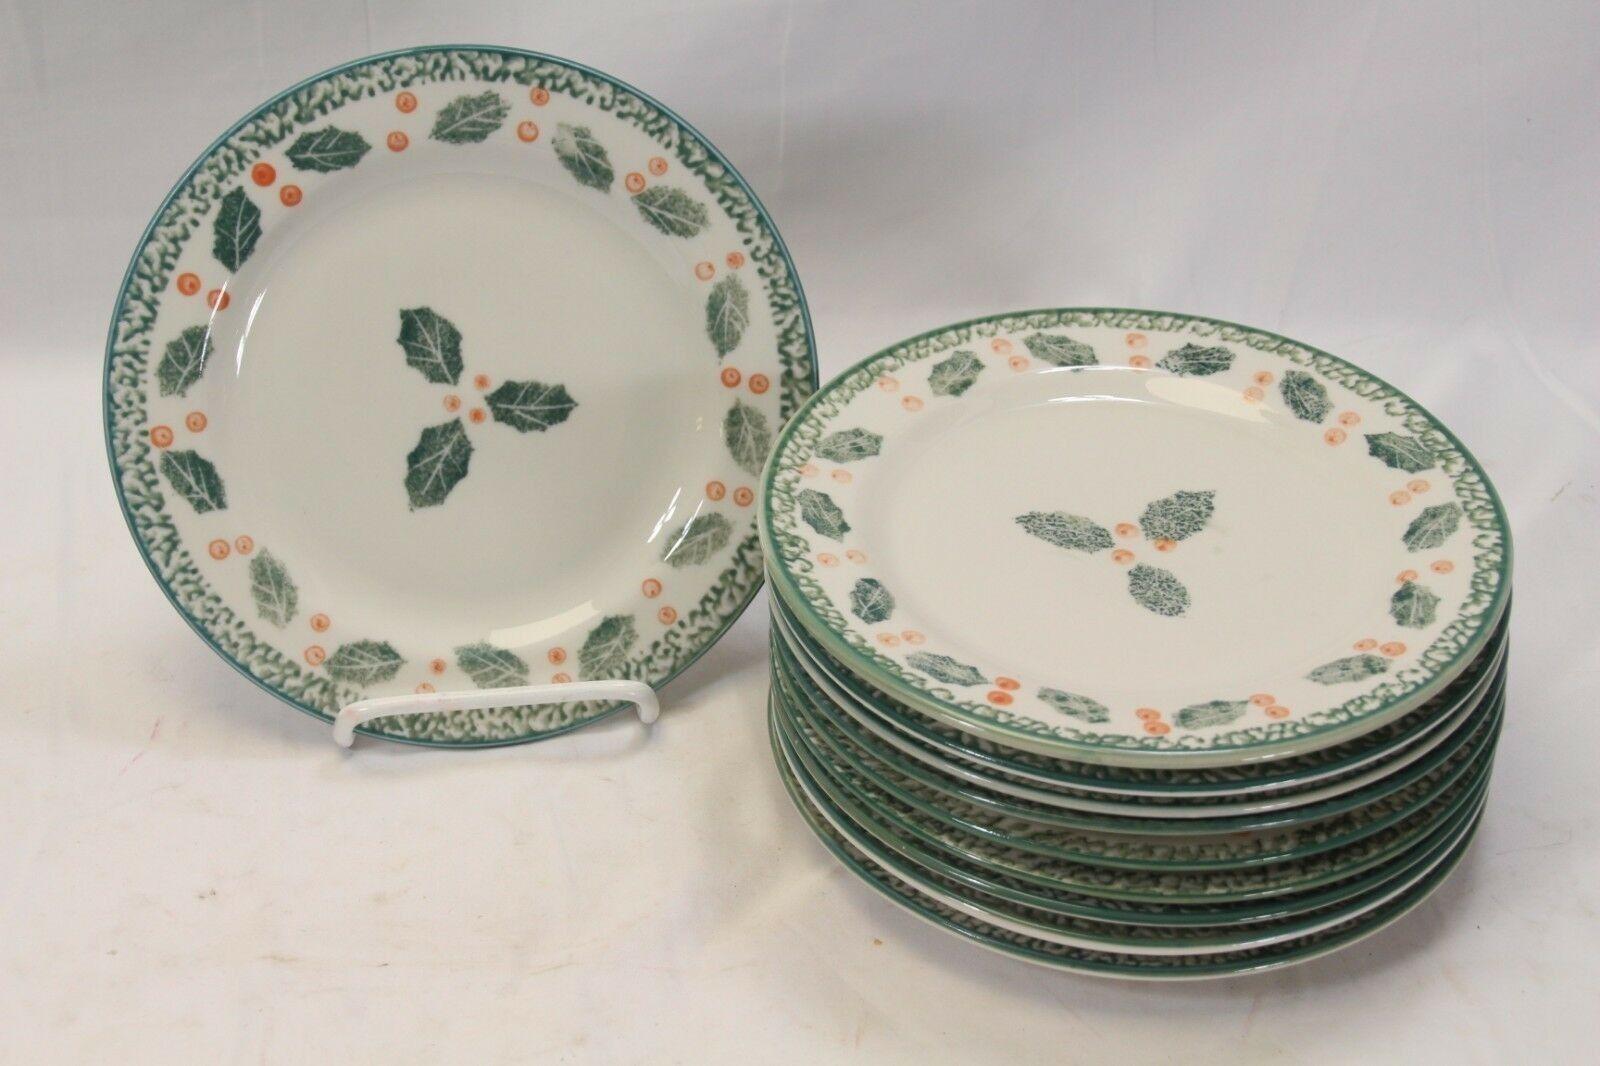 Montgomery Ward Holly Xmas Salad Plates 7.5  Set of 10